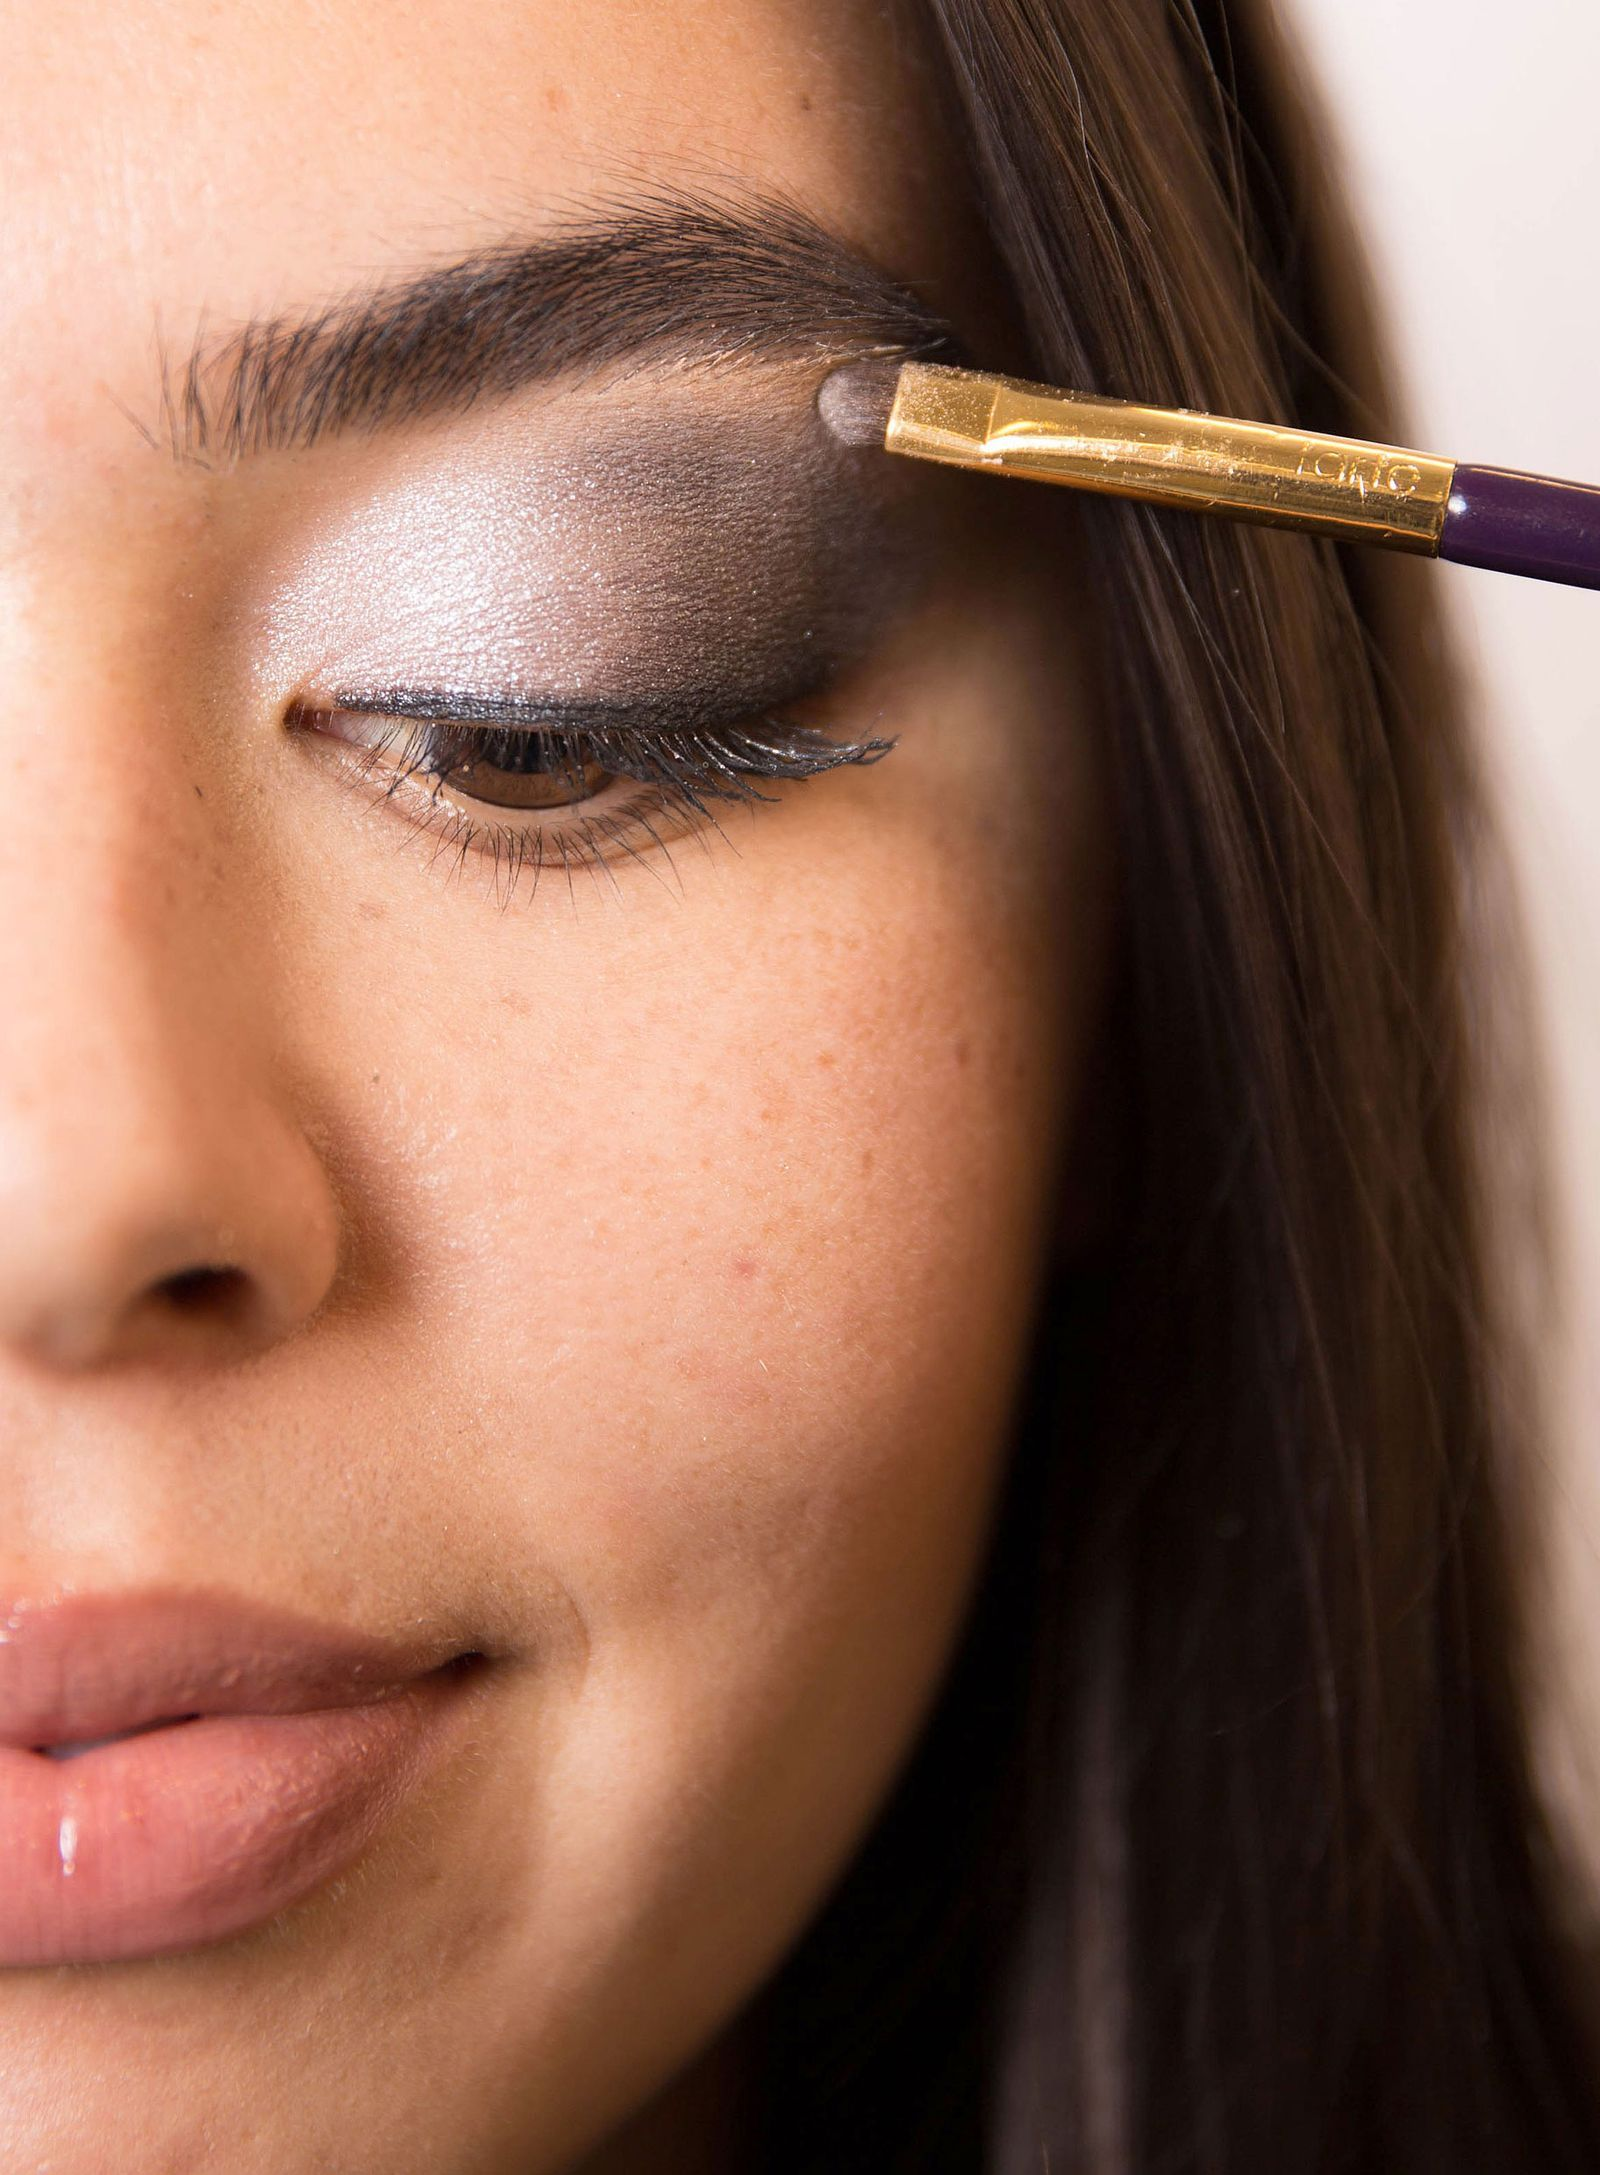 12 lifechanging ways to use eyeliner to create smoky eye